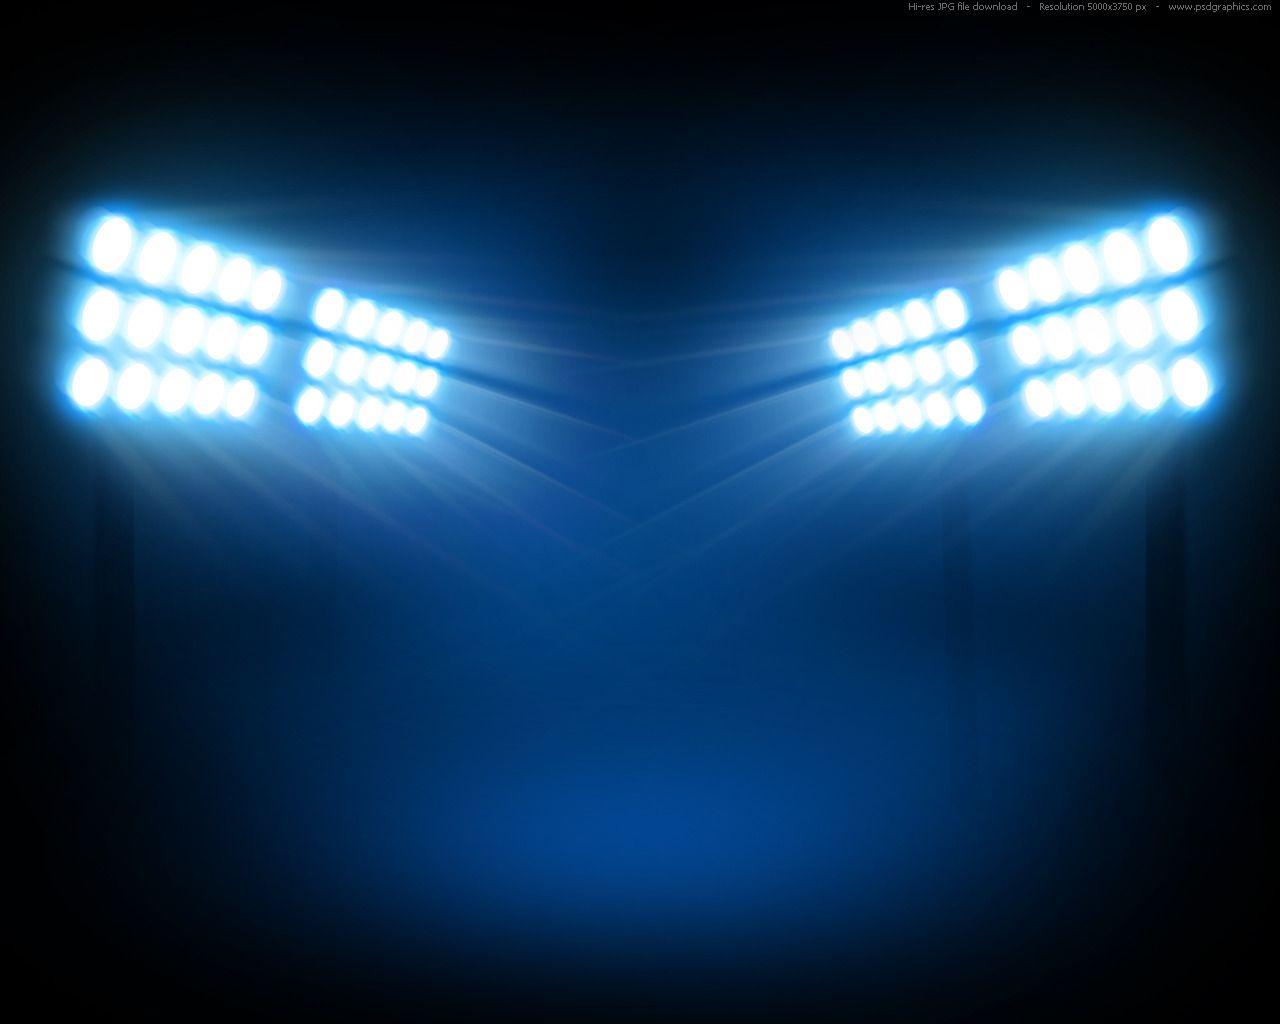 Mas Fondos Para Photoshop A Pedido Del Publico Stadium Lighting Football Background Flood Lights